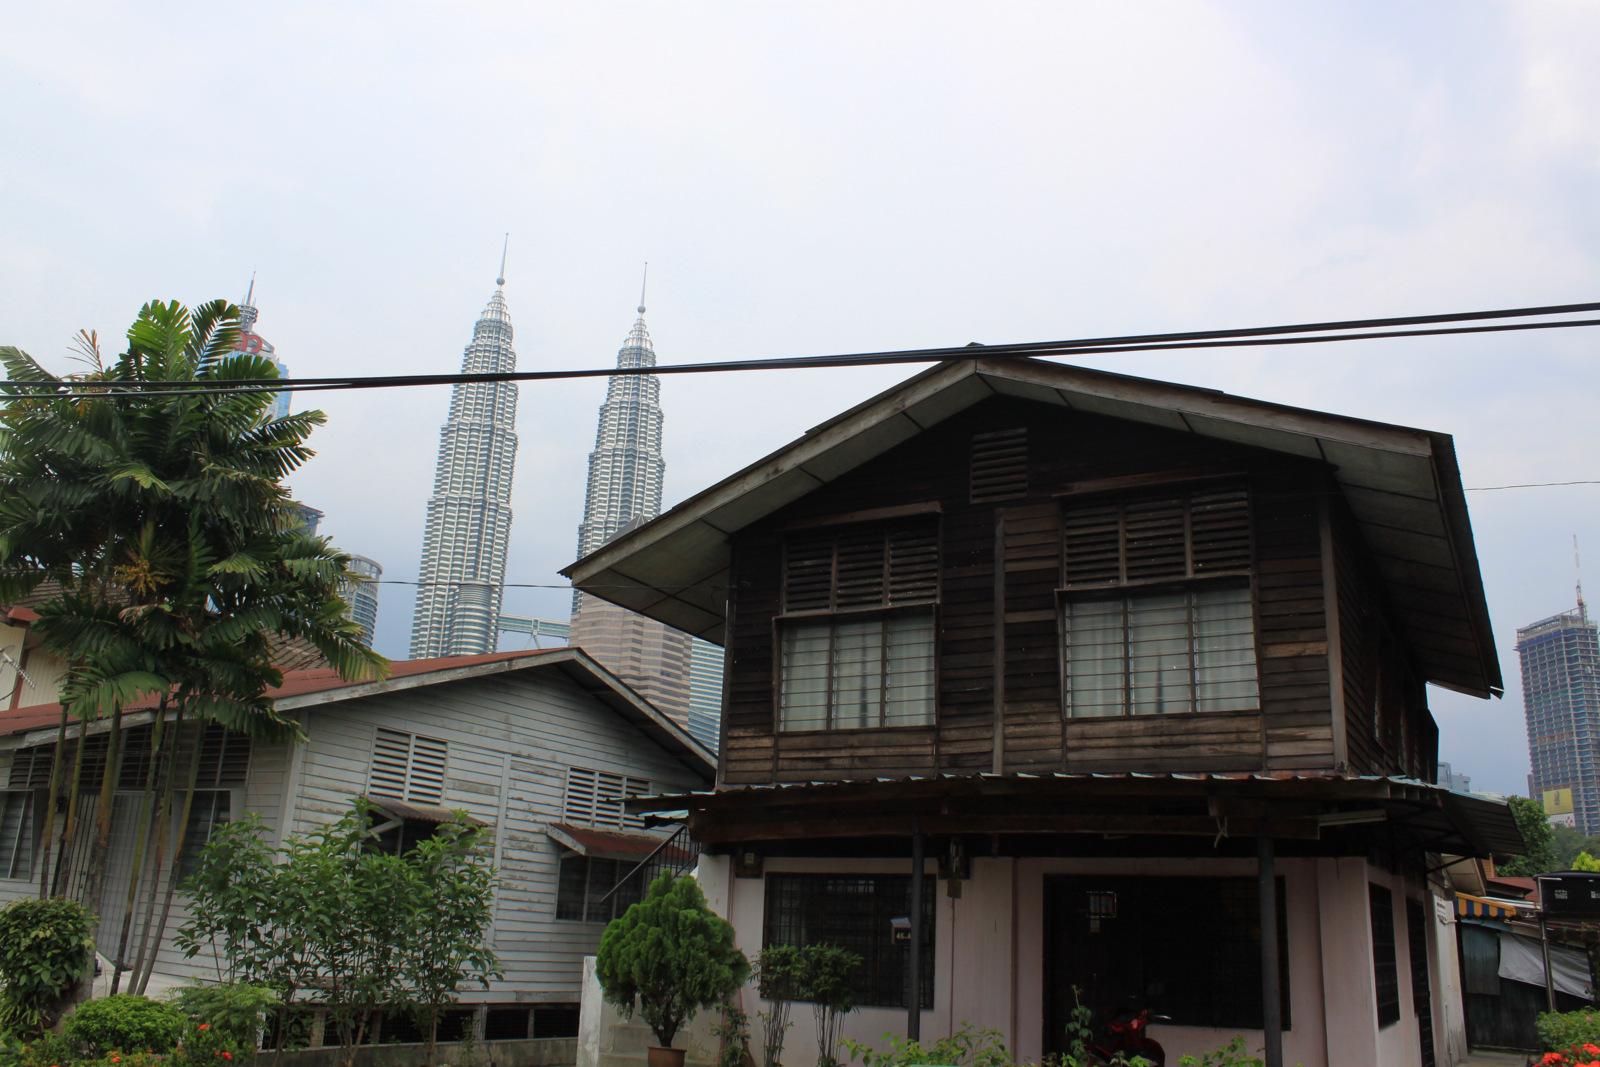 Kampung Baru - Kuala Lumpur